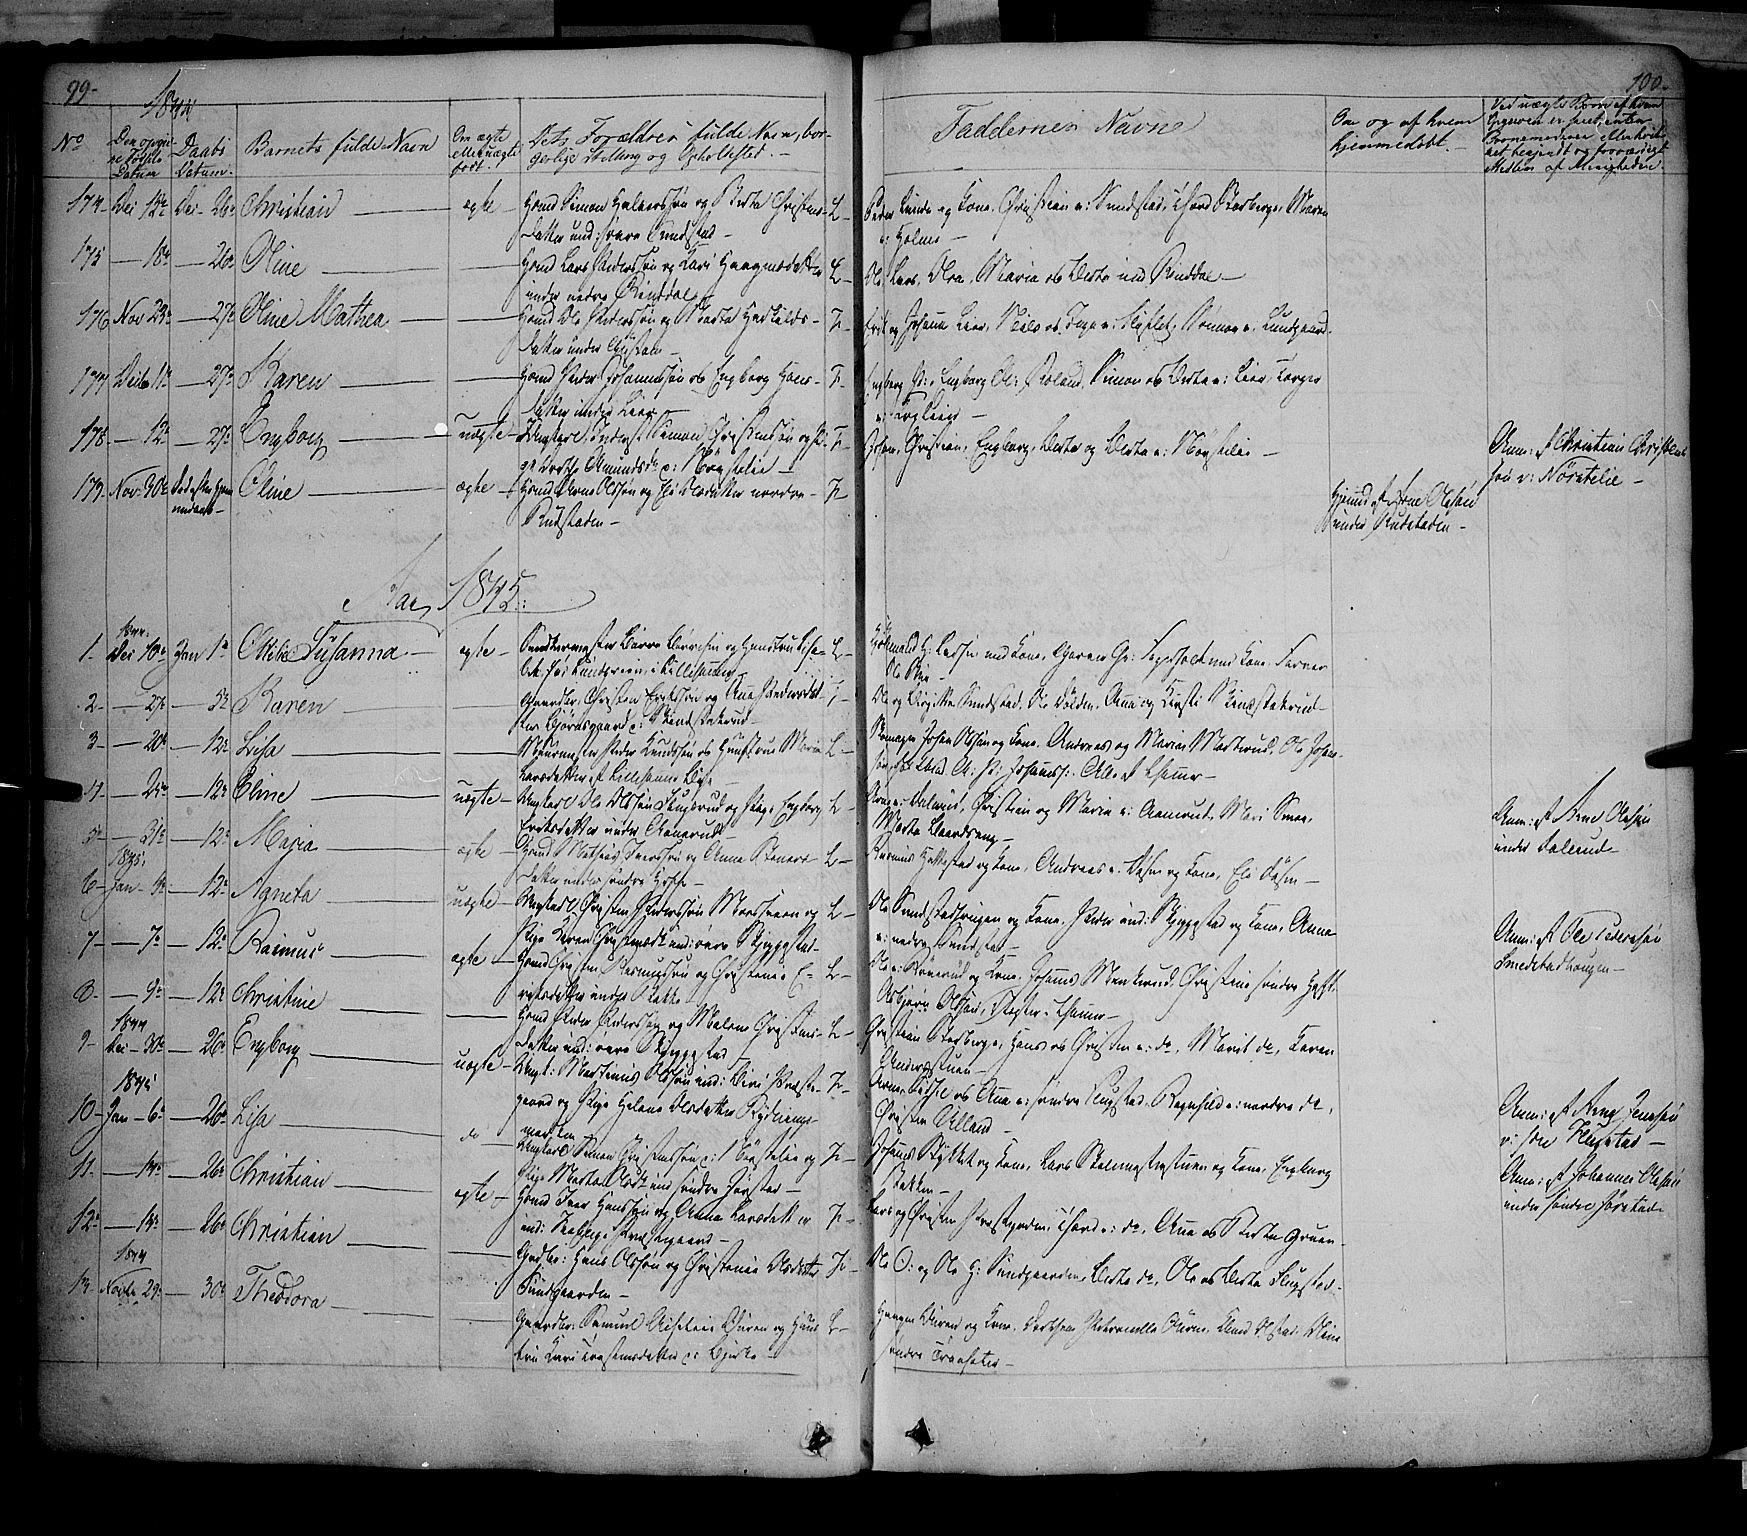 SAH, Fåberg prestekontor, Ministerialbok nr. 5, 1836-1854, s. 99-100